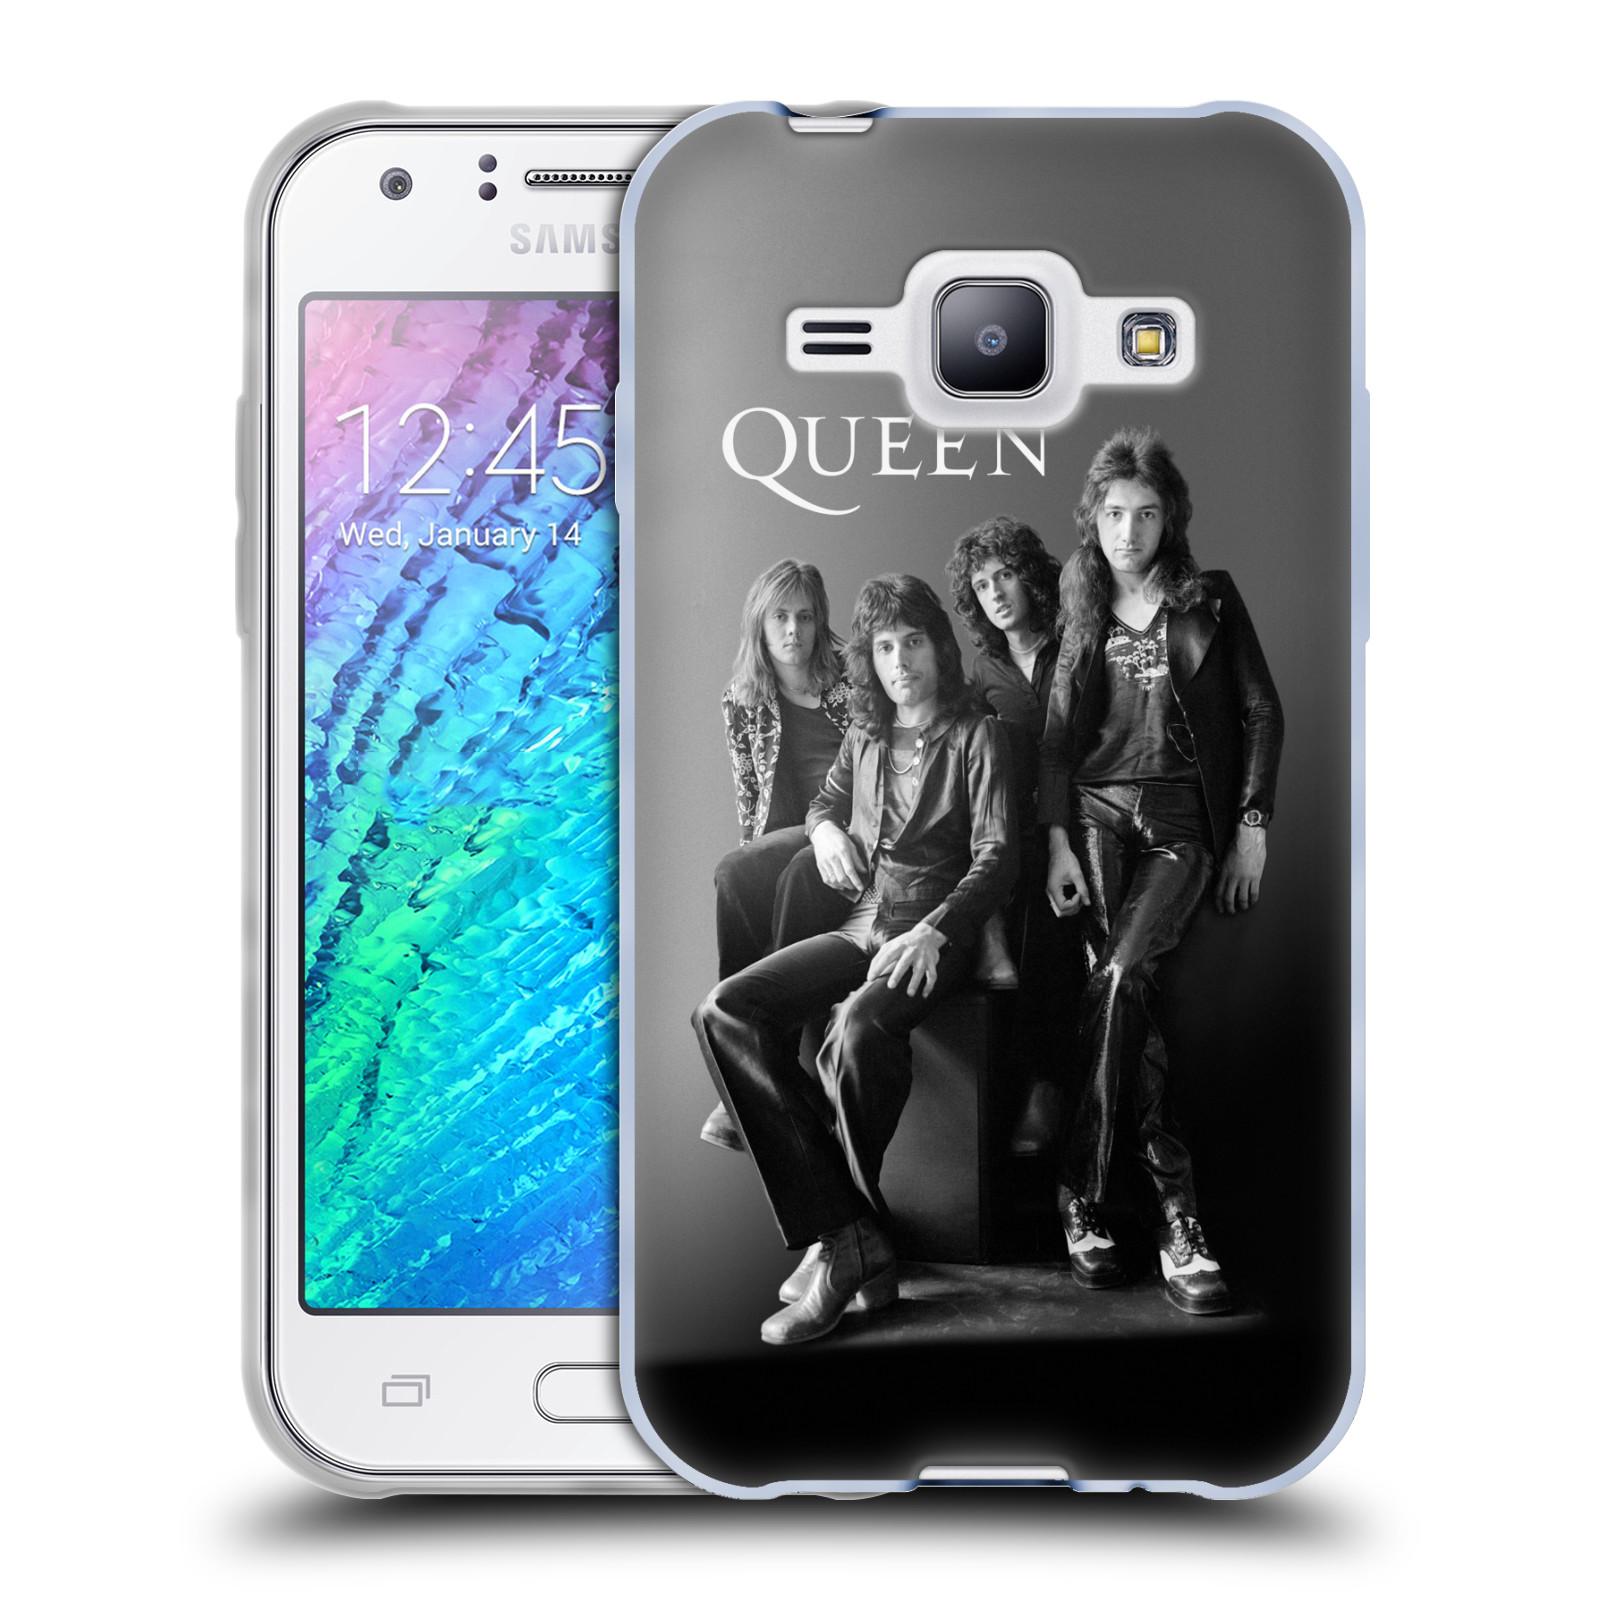 Silikonové pouzdro na mobil Samsung Galaxy J1 HEAD CASE Queen - Skupina (Silikonový kryt či obal na mobilní telefon licencovaným motivem Queen pro Samsung Galaxy J1 a J1 Duos)